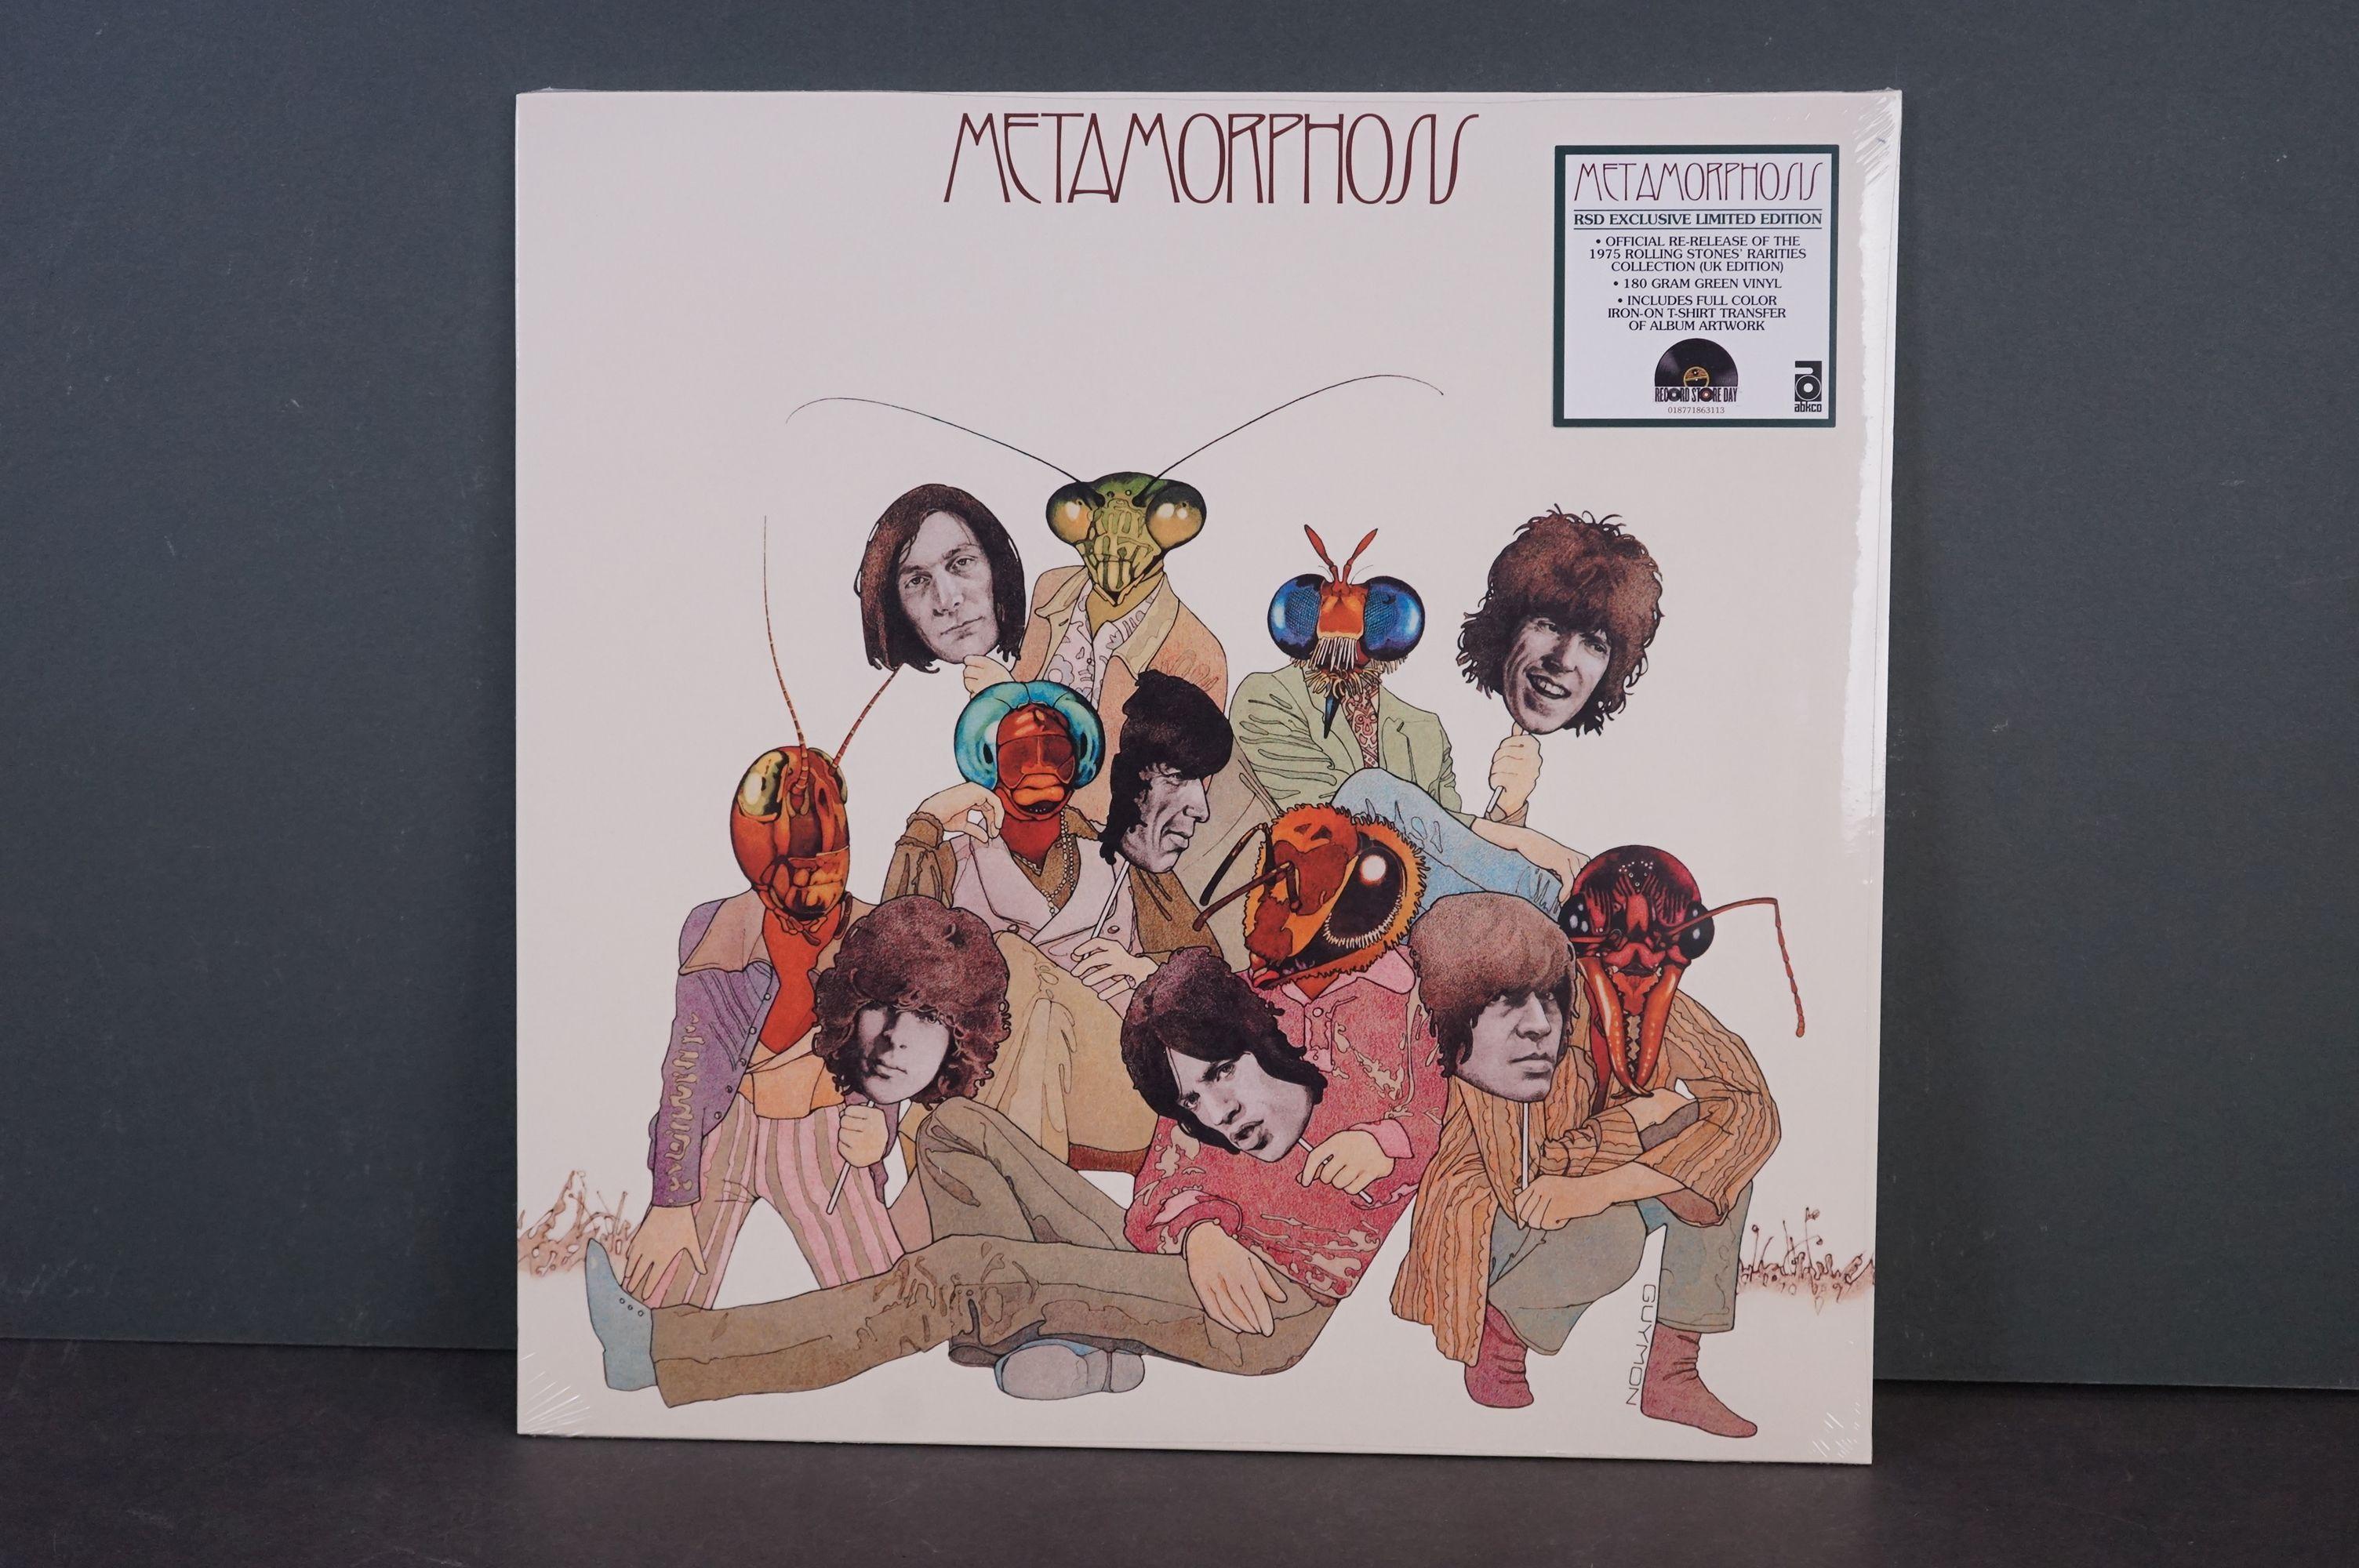 Vinyl - The Rolling Stones Metamorhosis RSD exclusive ltd edn LPABKCO 8631-1, sealed